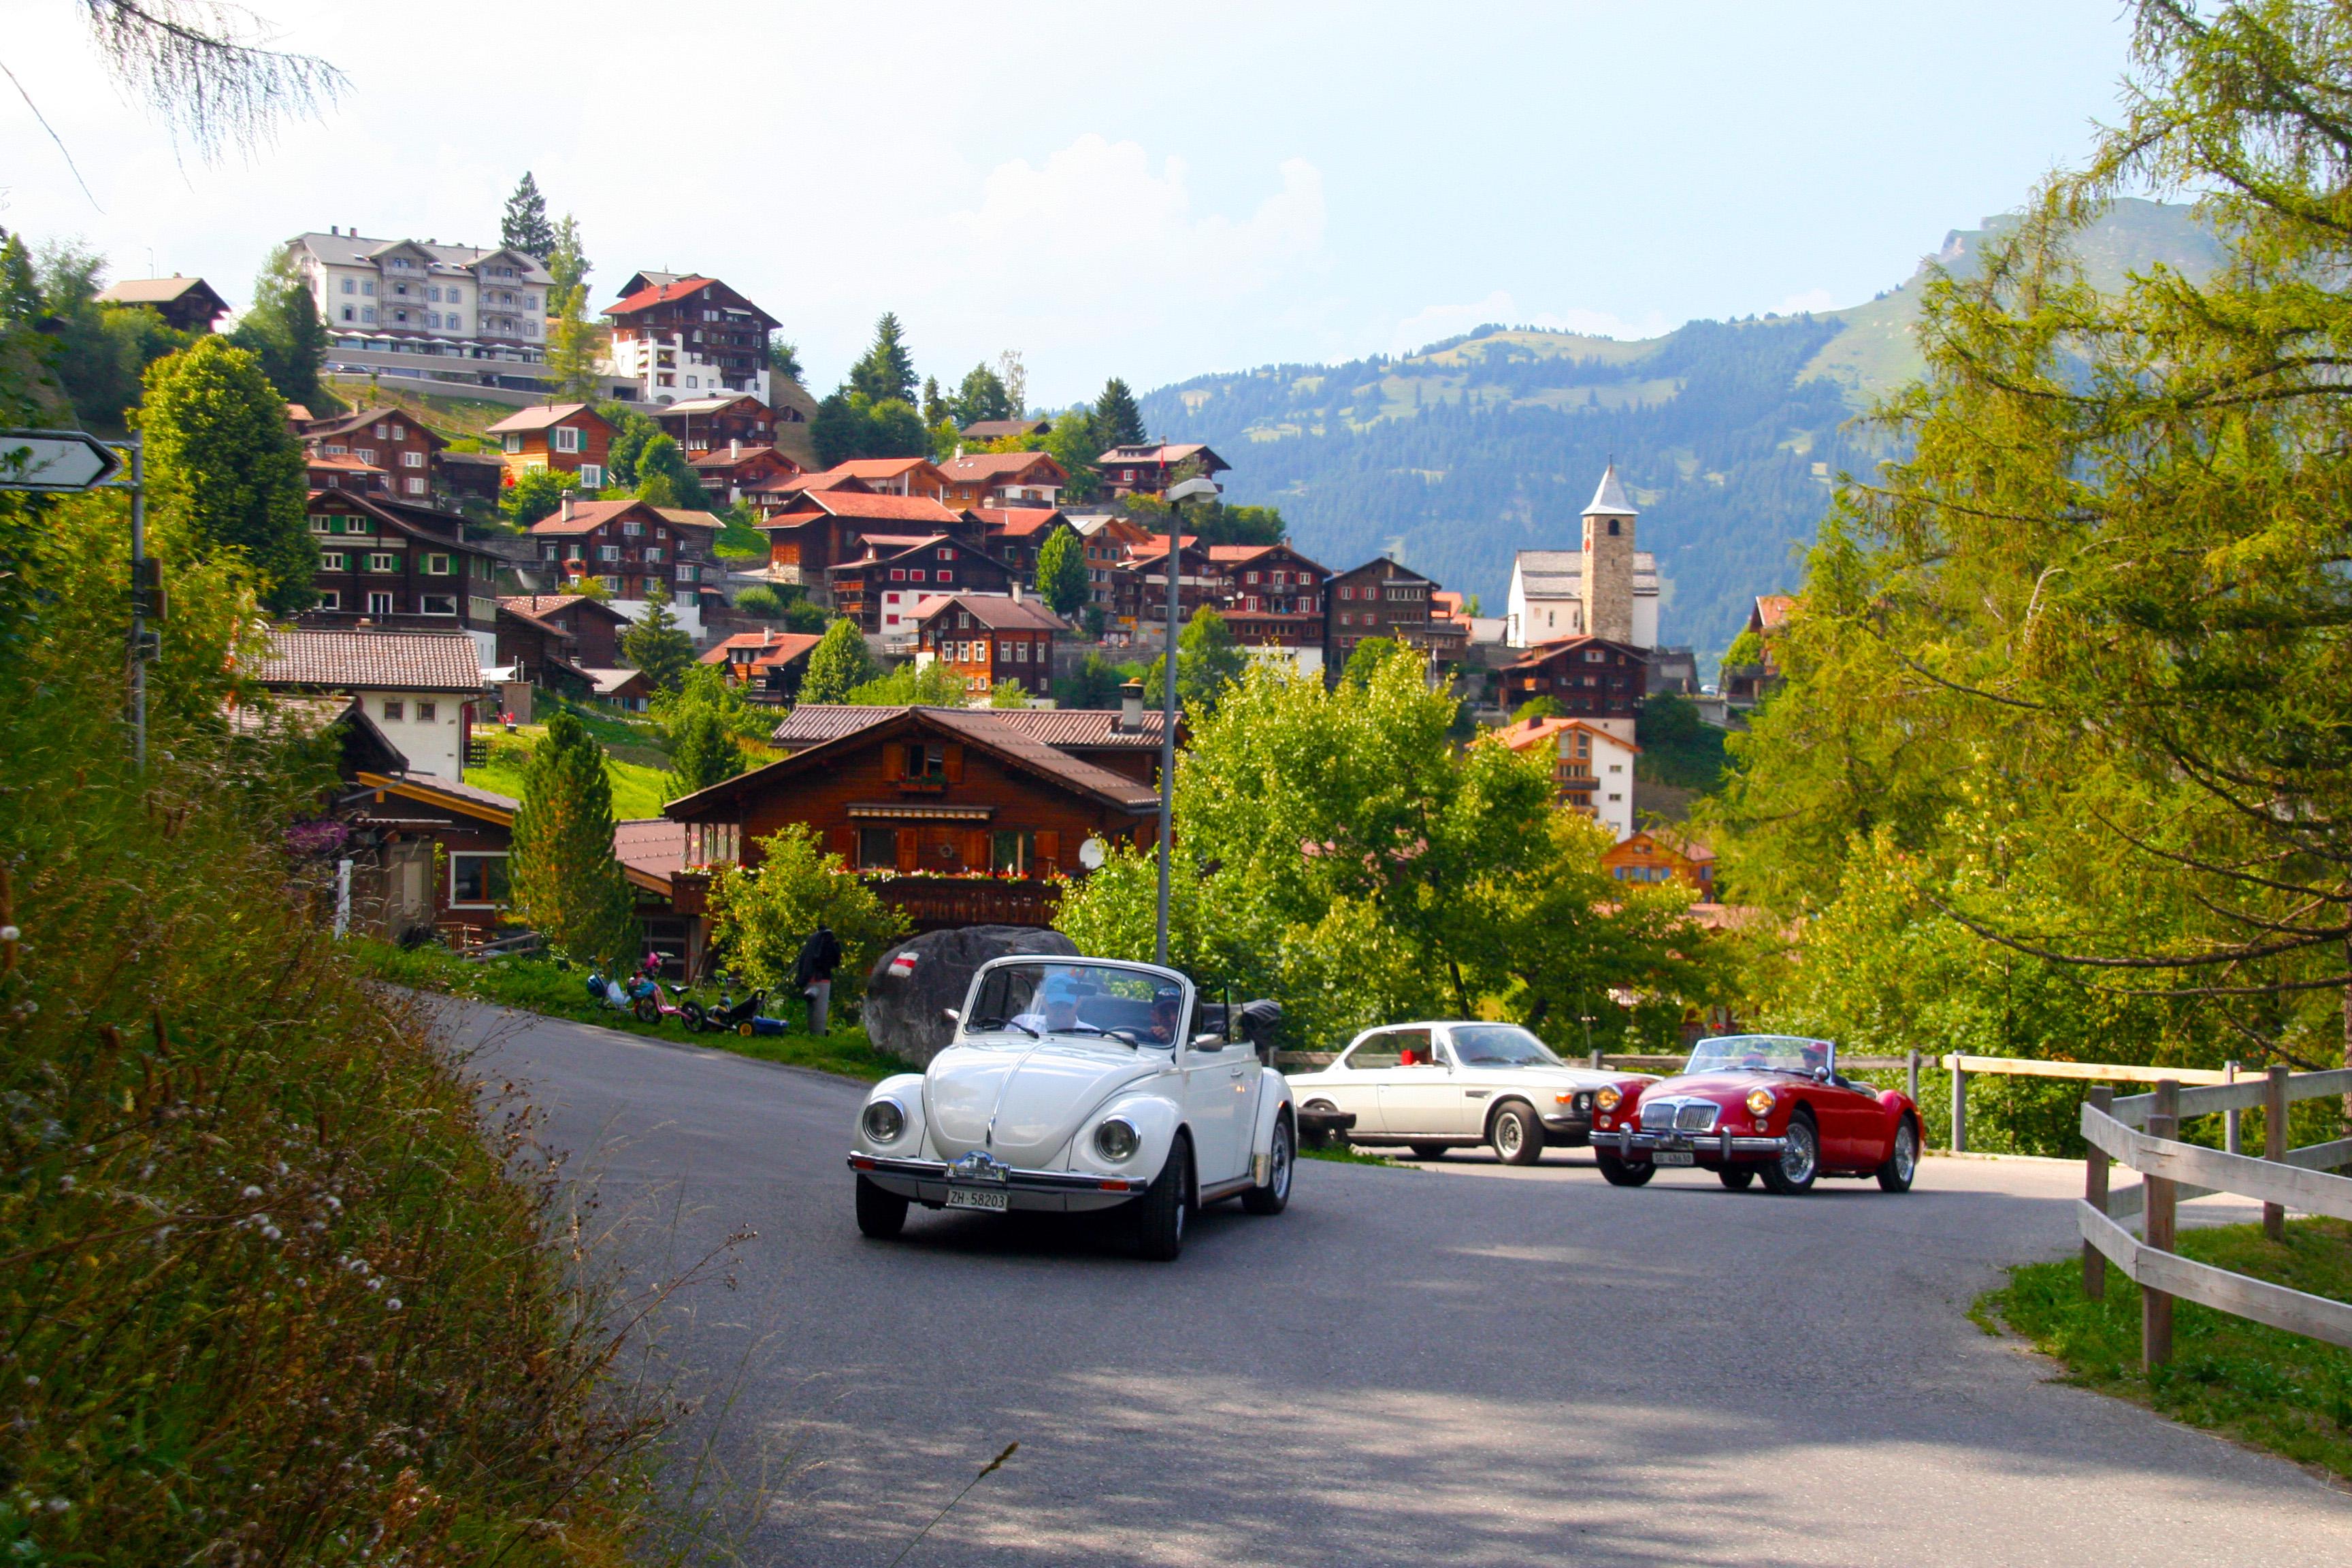 4. Alpina Classic Car